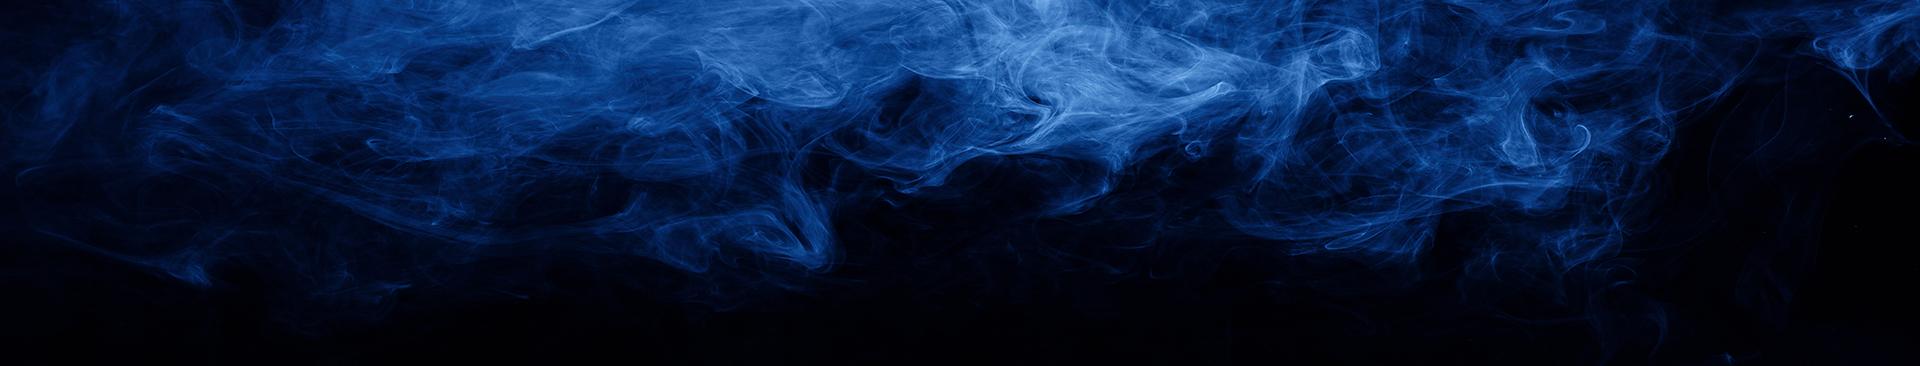 Digitale Transformation ICONPARC Blauer Rauch